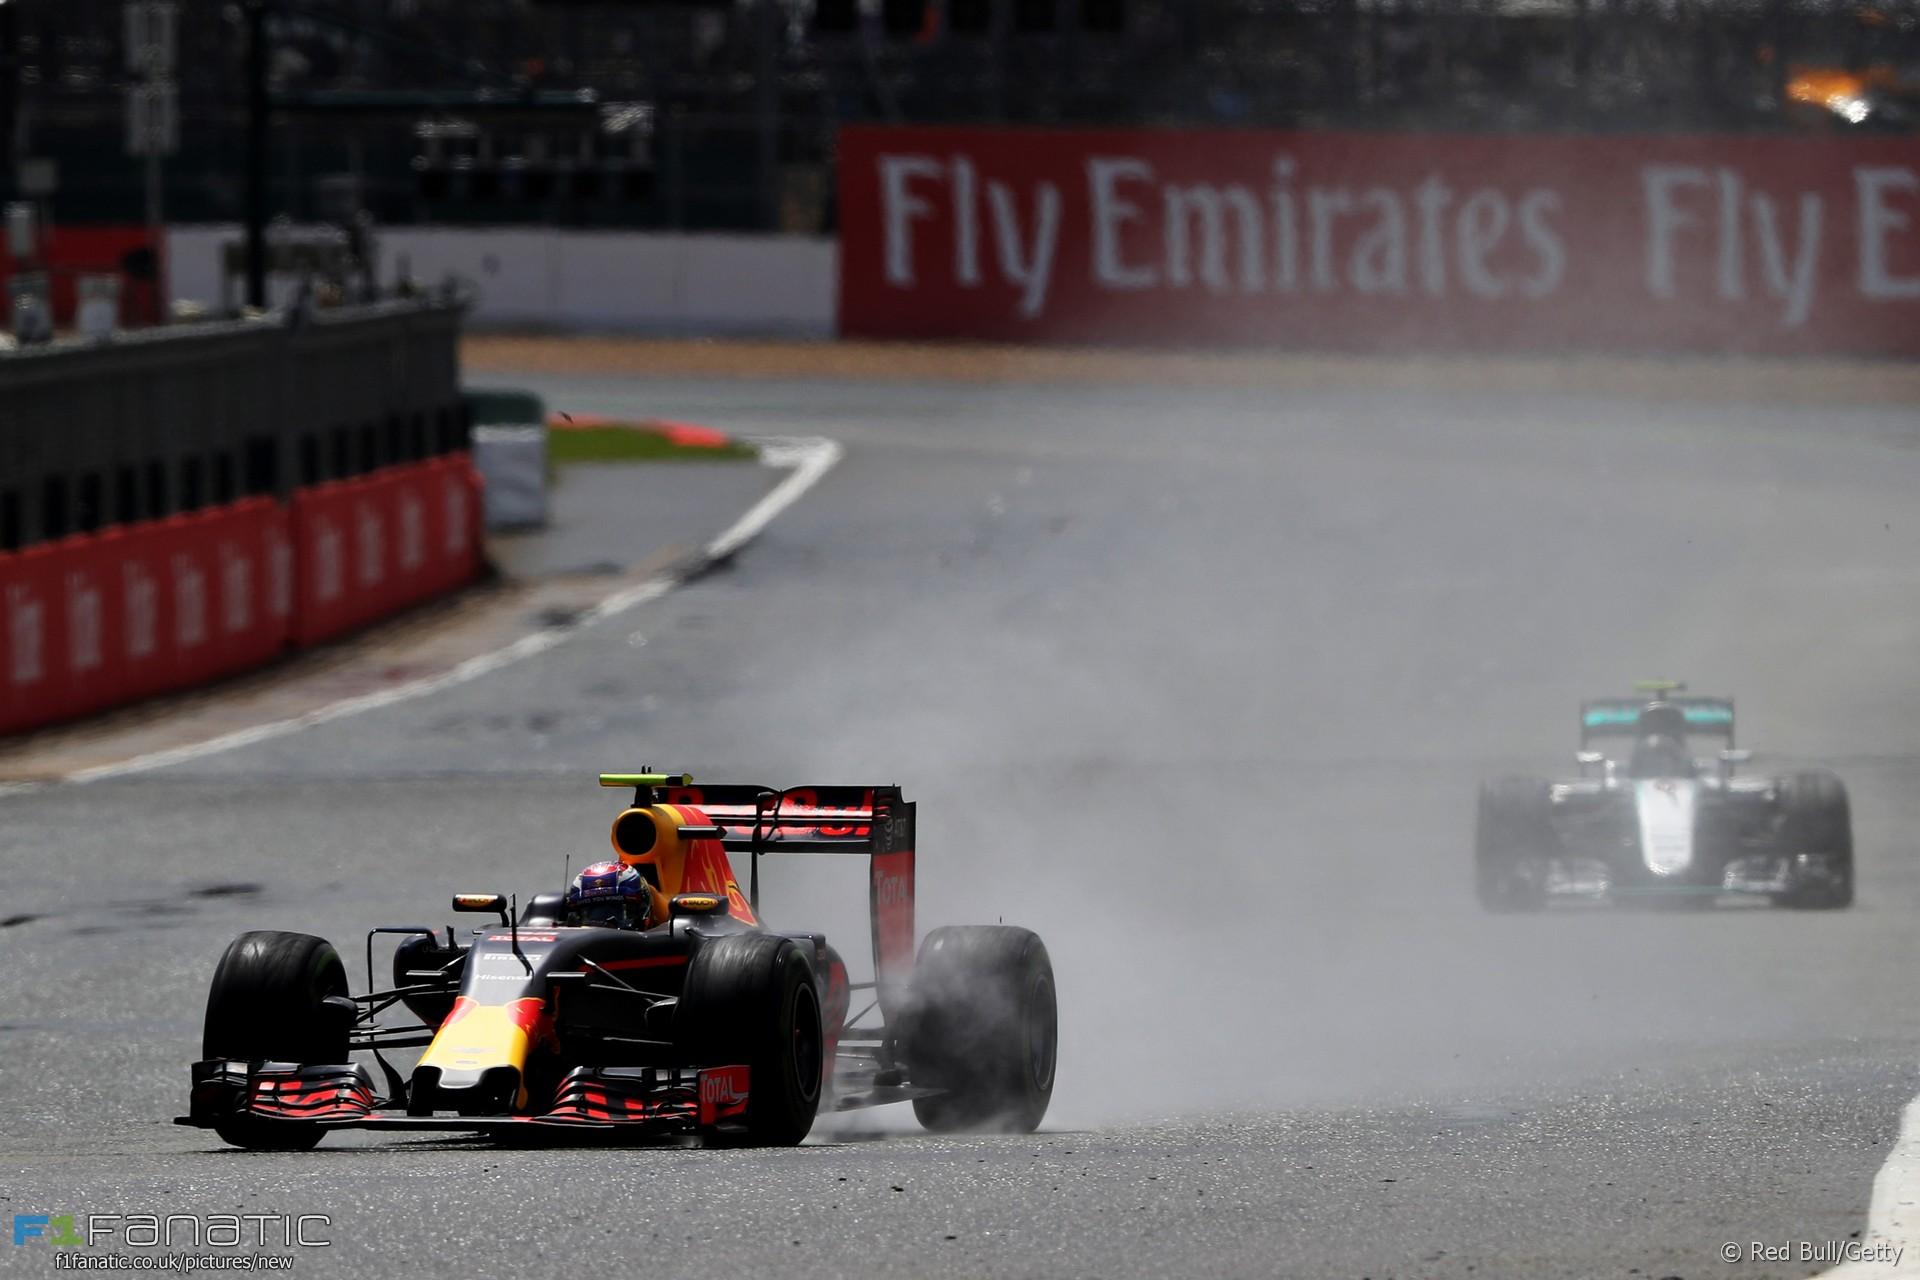 Max Verstappen, Red Bull, Silverstone, 2016